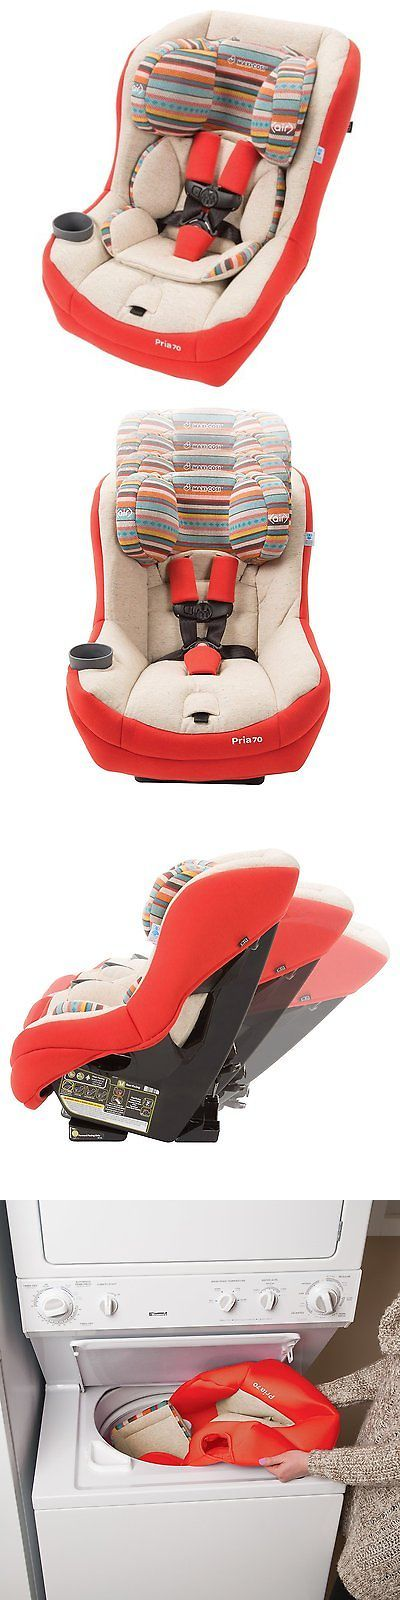 Infant Car Seat 5 20 Lbs 66696 Maxi Cosi Pria 70 Air Convertible